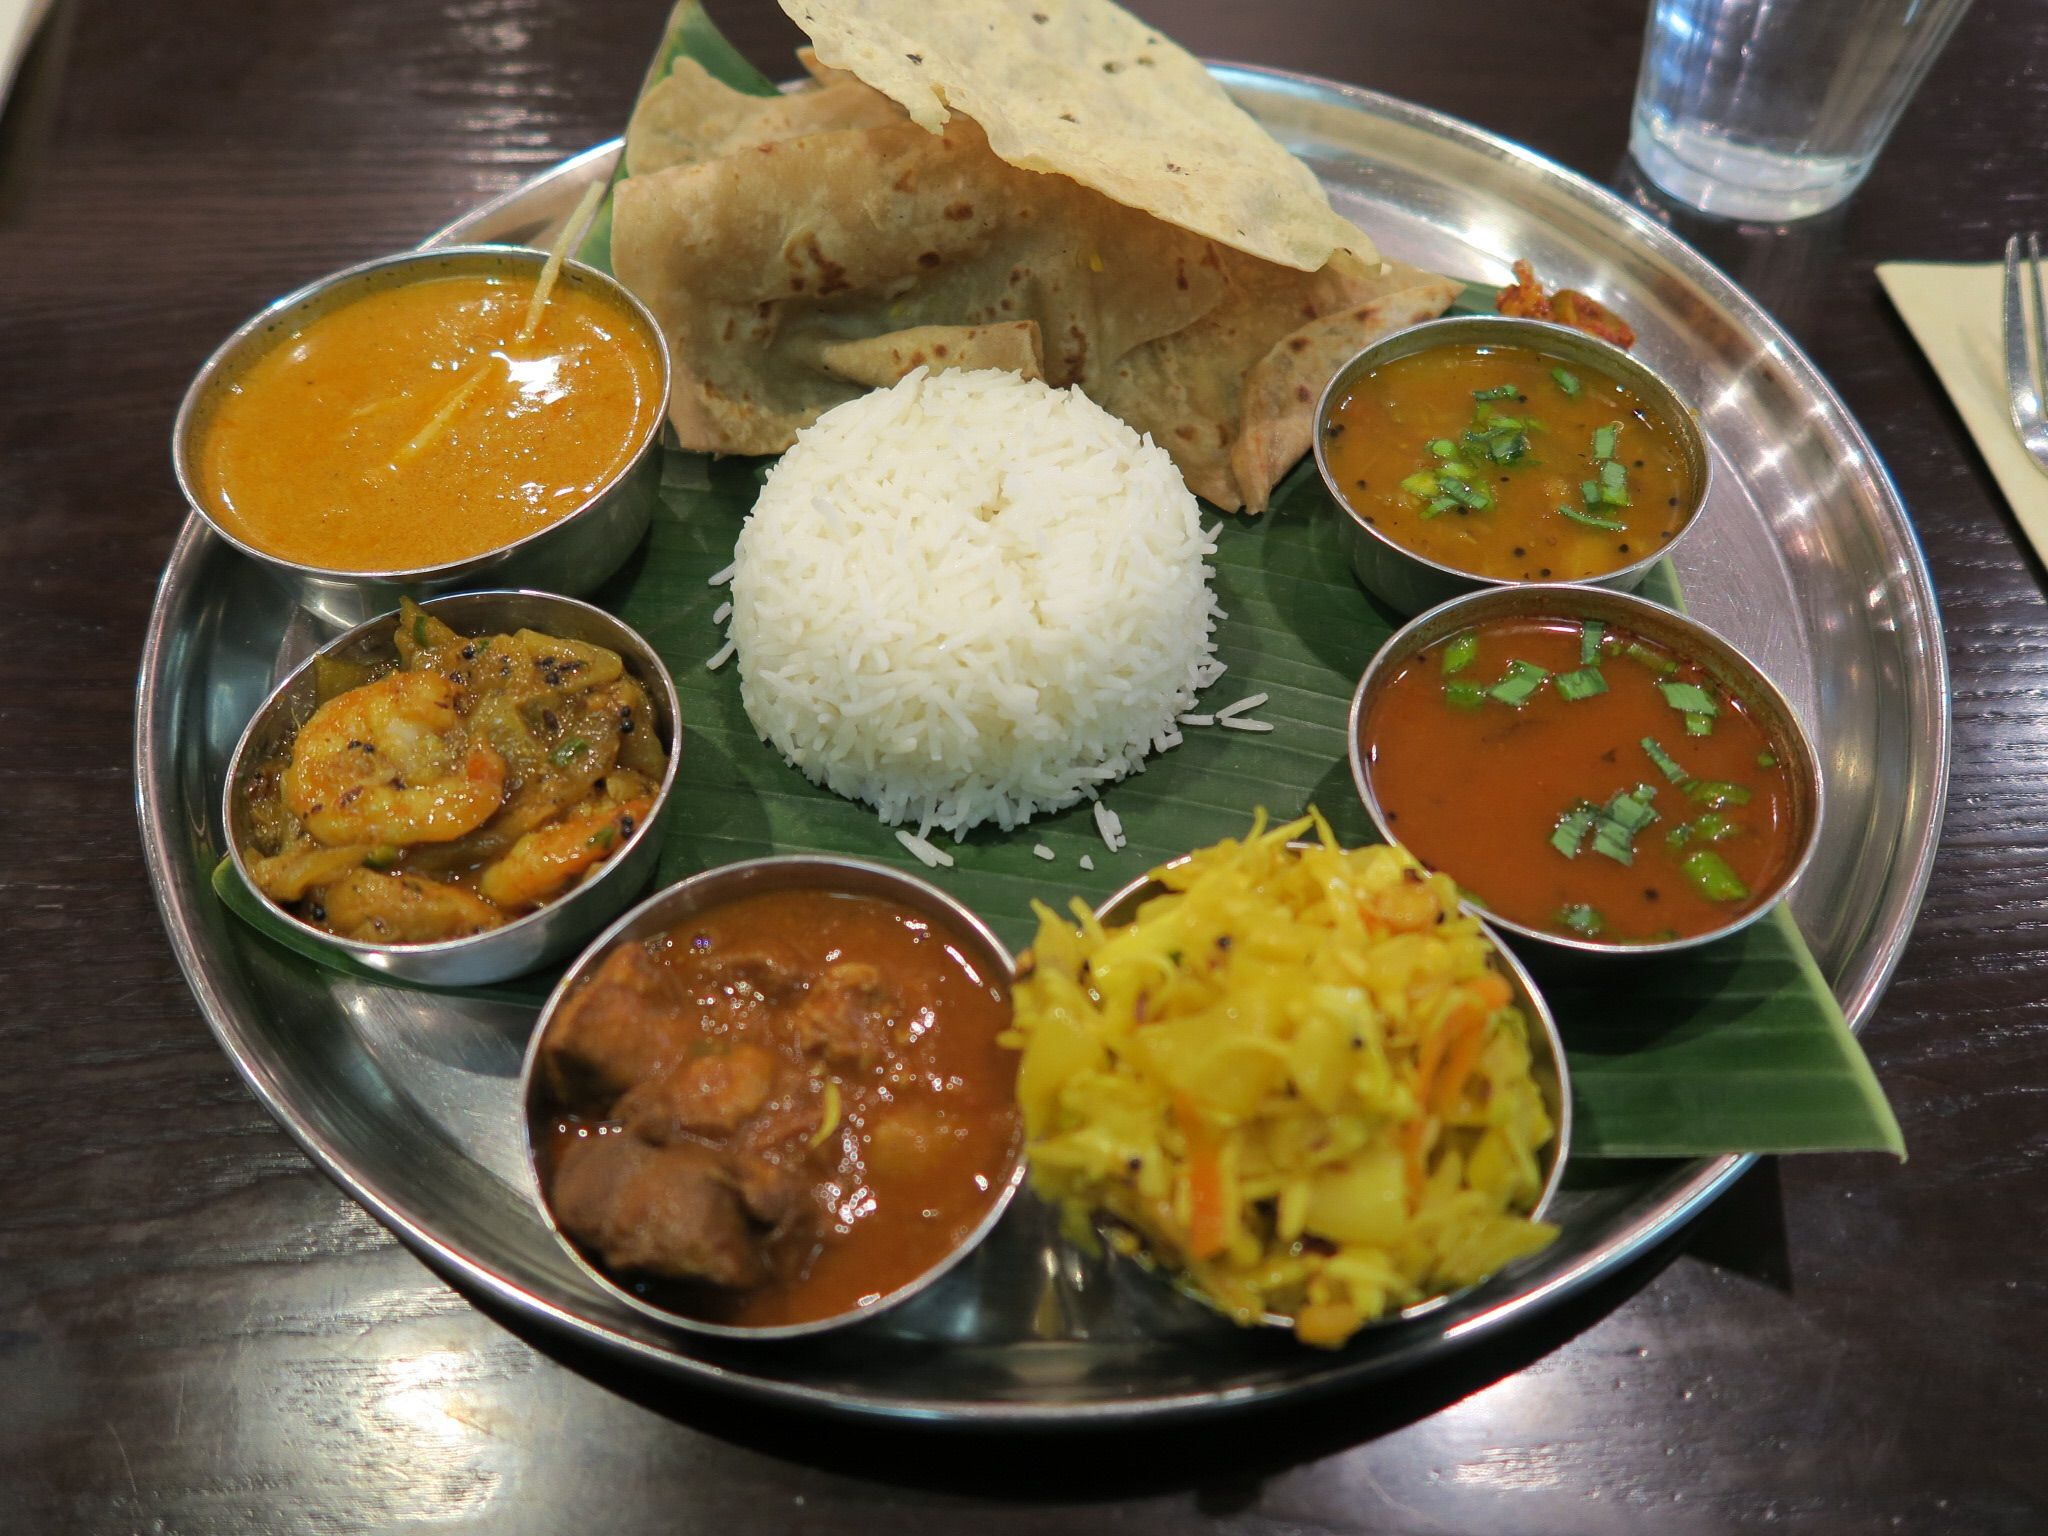 if you use indian curry well keep calories down 37061306.jpg - インドカレーは上手く利用すればカロリーを抑えダイエット食になるらしい